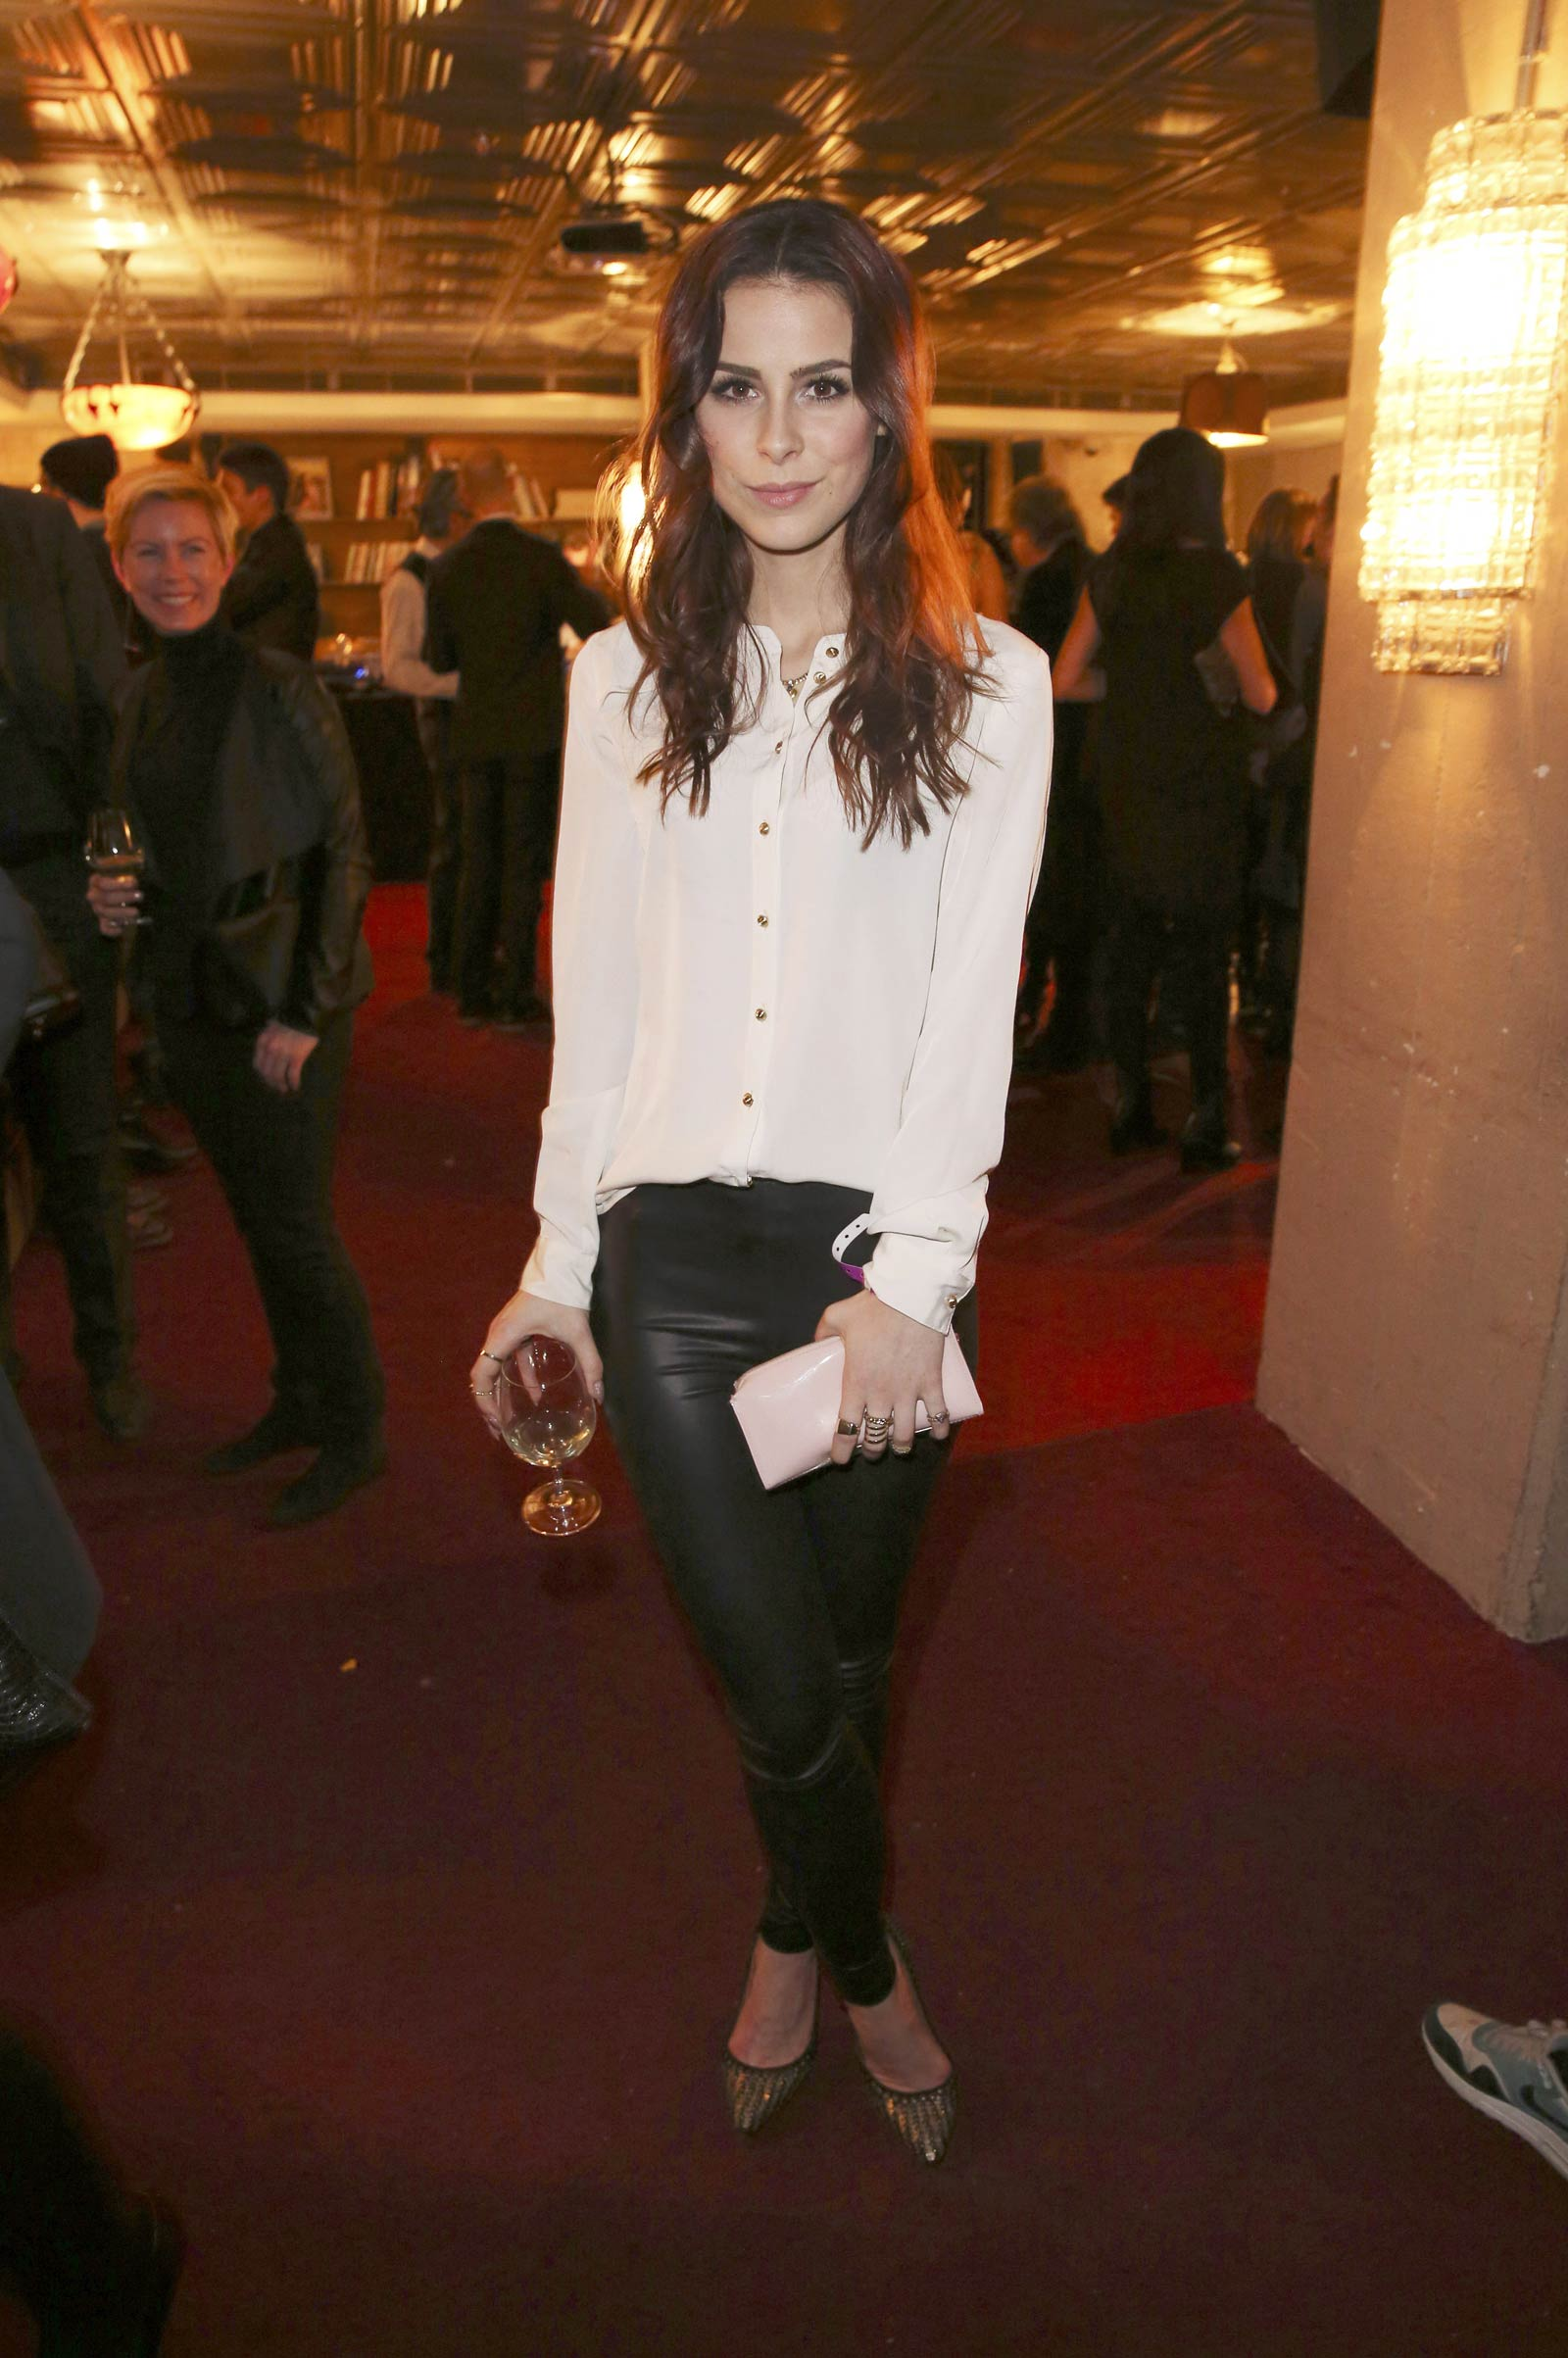 Lena Meyer Landrut attends Mercedes Benz Fashion Week Kate Bosworth